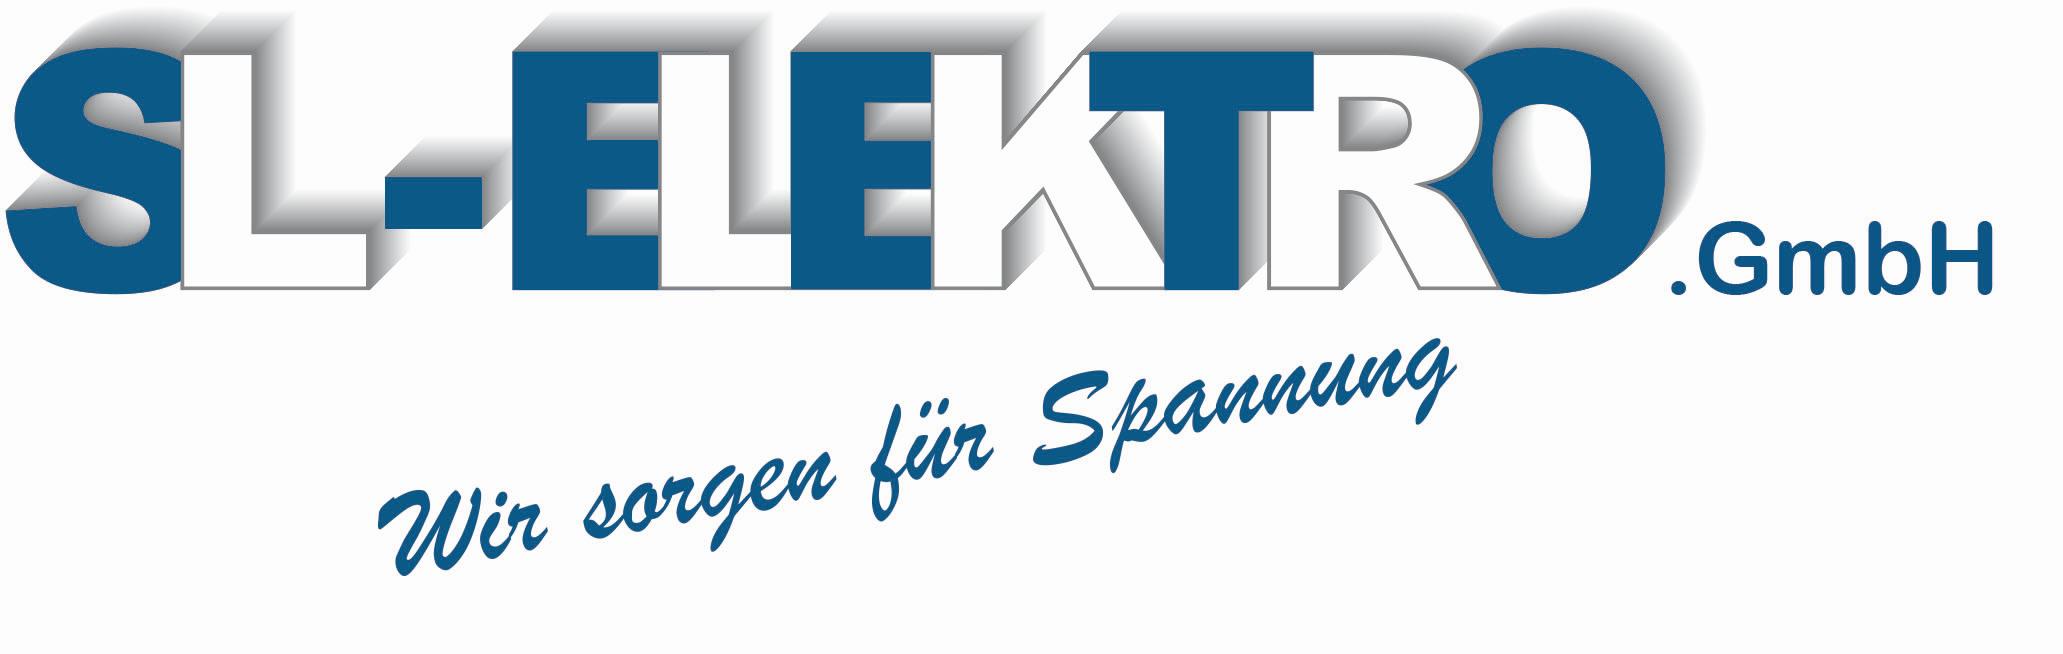 SL-Elektro.GmbH